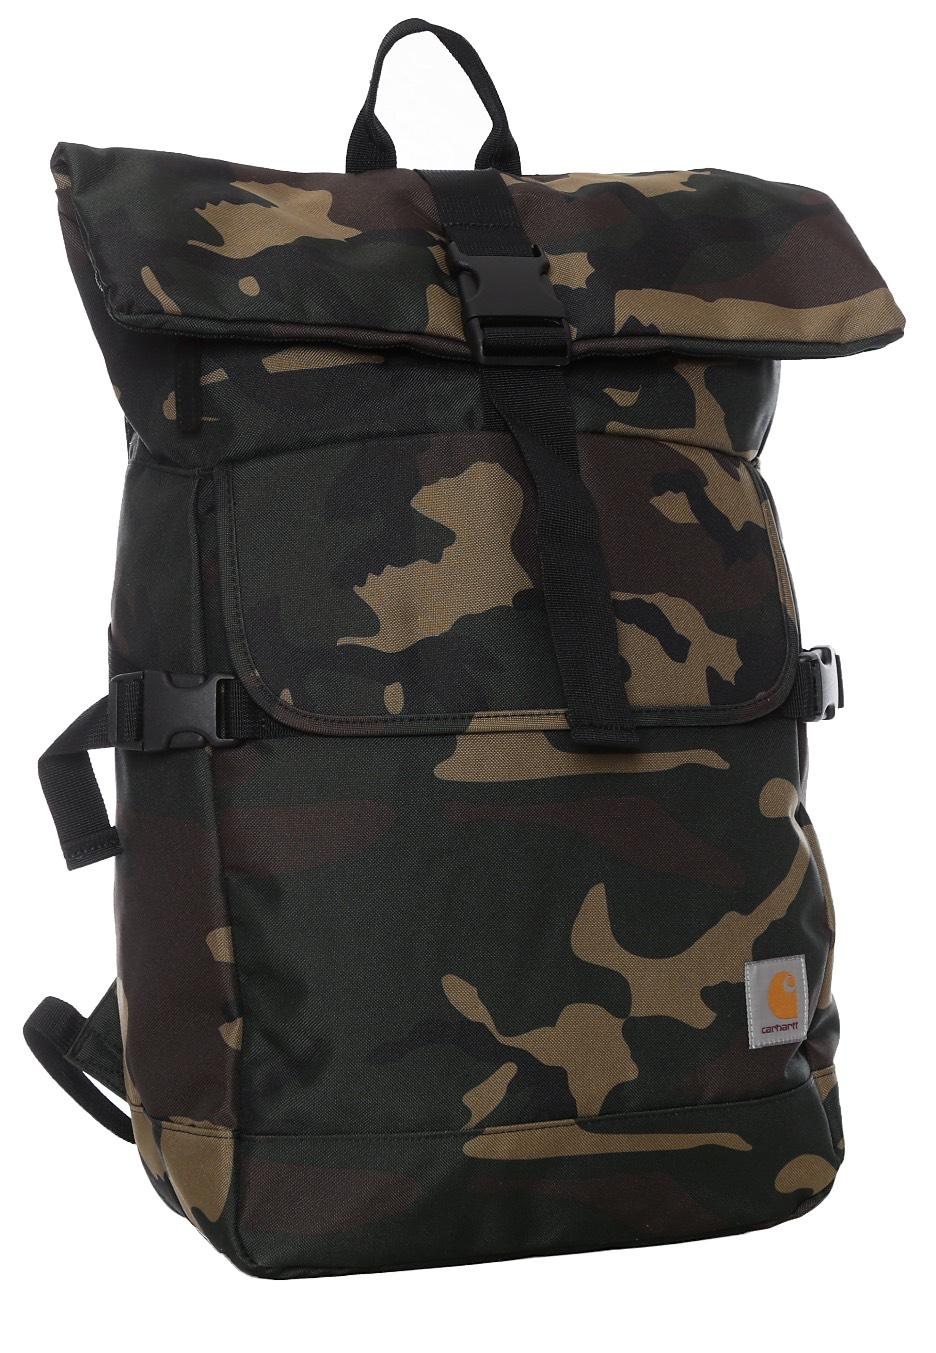 Carhartt WIP - Philips Duck Camo Laurel - Backpack - Streetwear Shop -  Impericon.com Worldwide